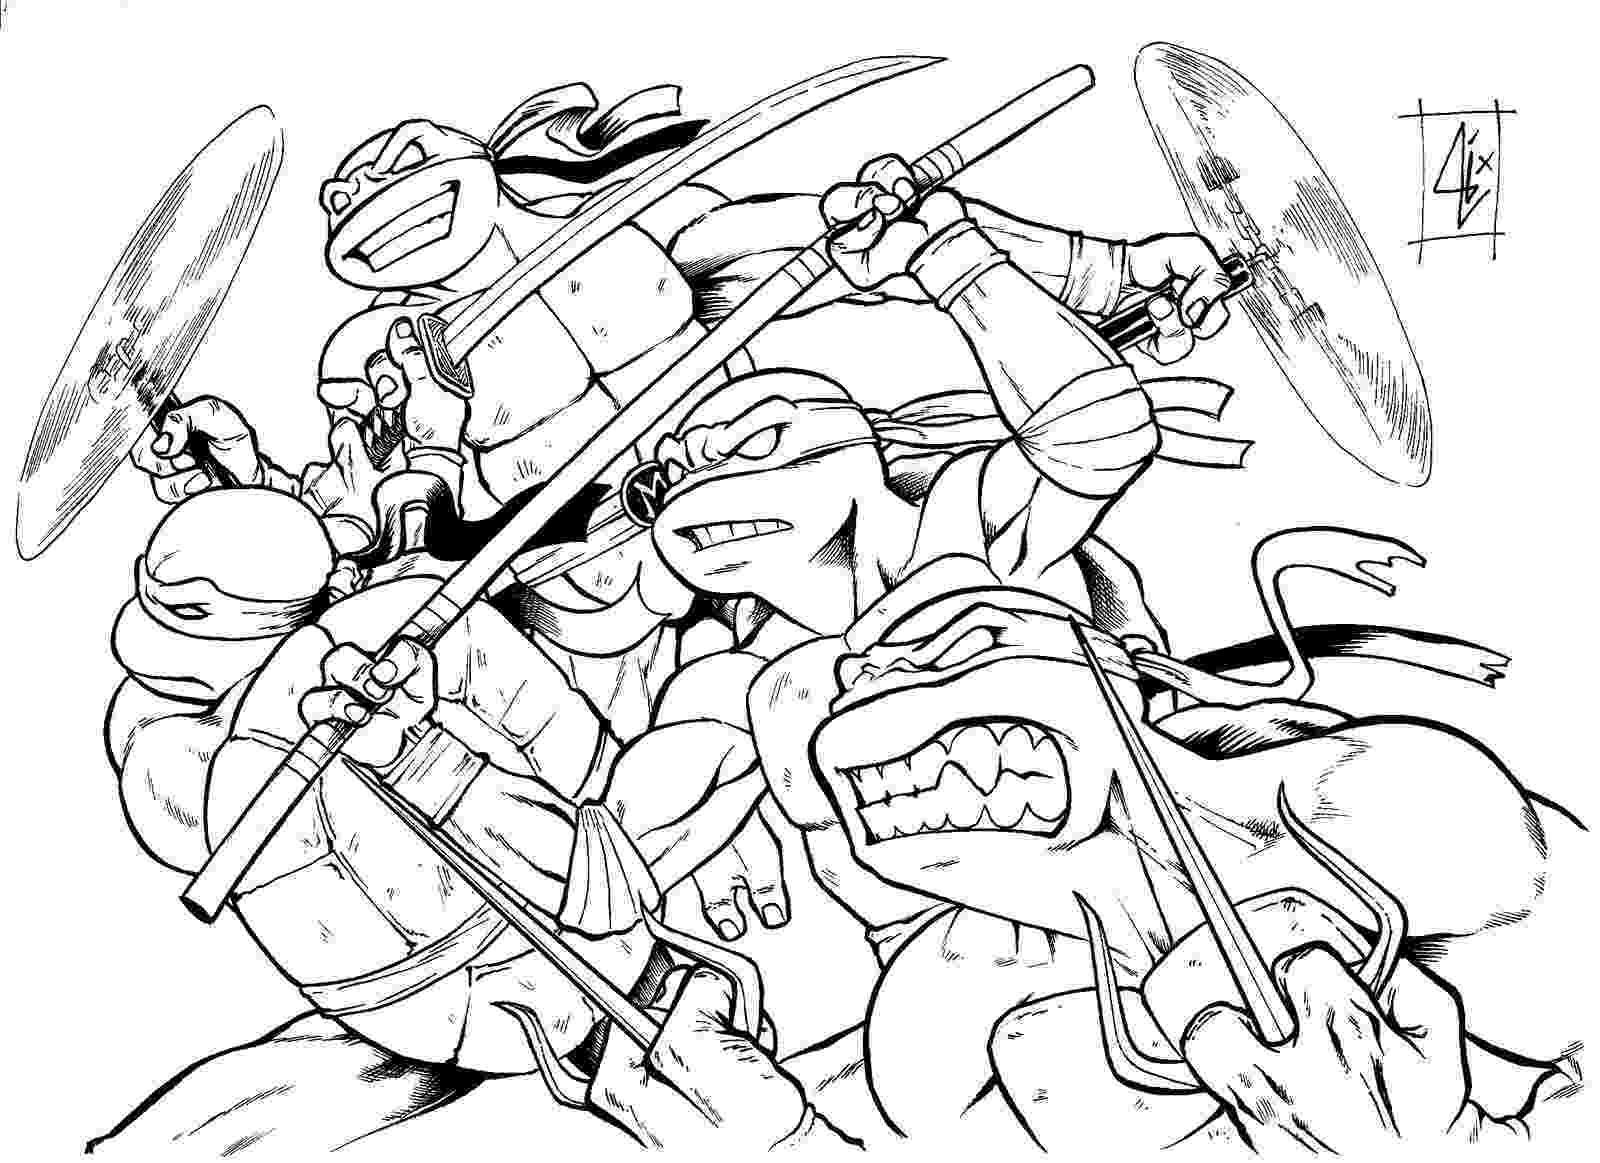 teenage mutant ninja turtles coloring pages shredder teenage mutant ninja turtles coloring page mutant pages coloring teenage ninja turtles